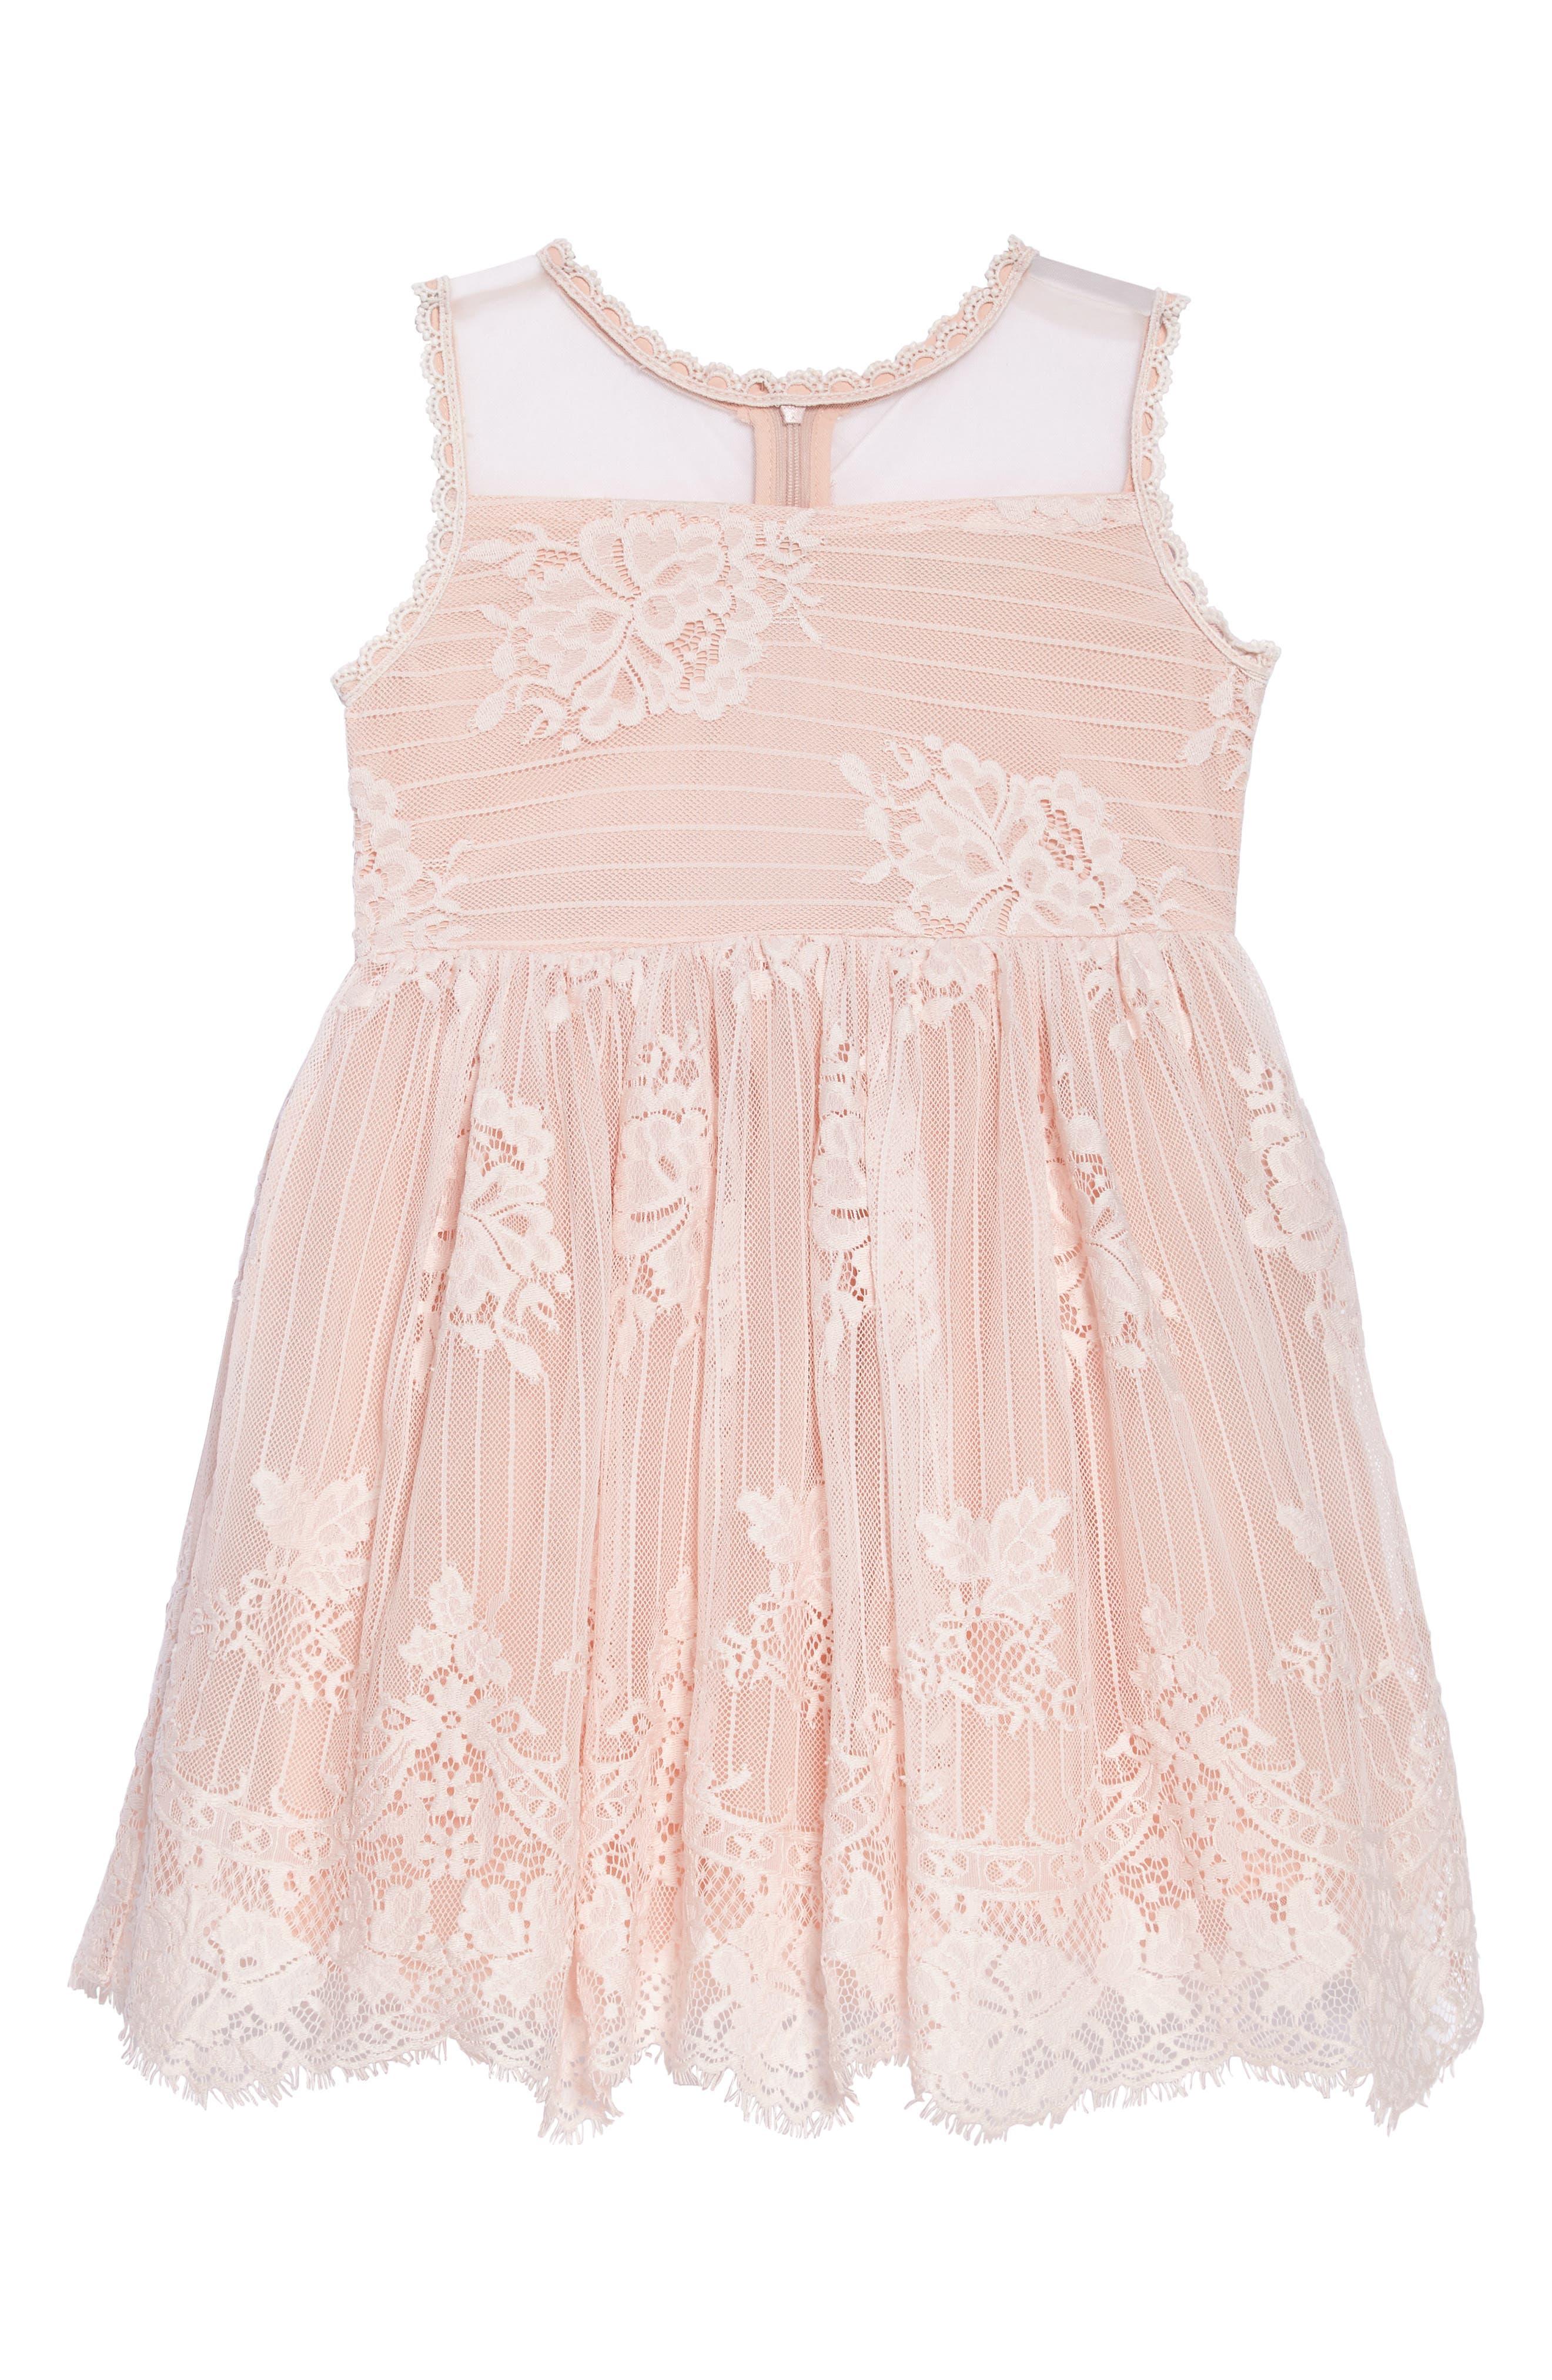 Main Image - Doe A Dear Lace Fit & Flare Dress (Toddler Girls, Little Girls & Big Girls)